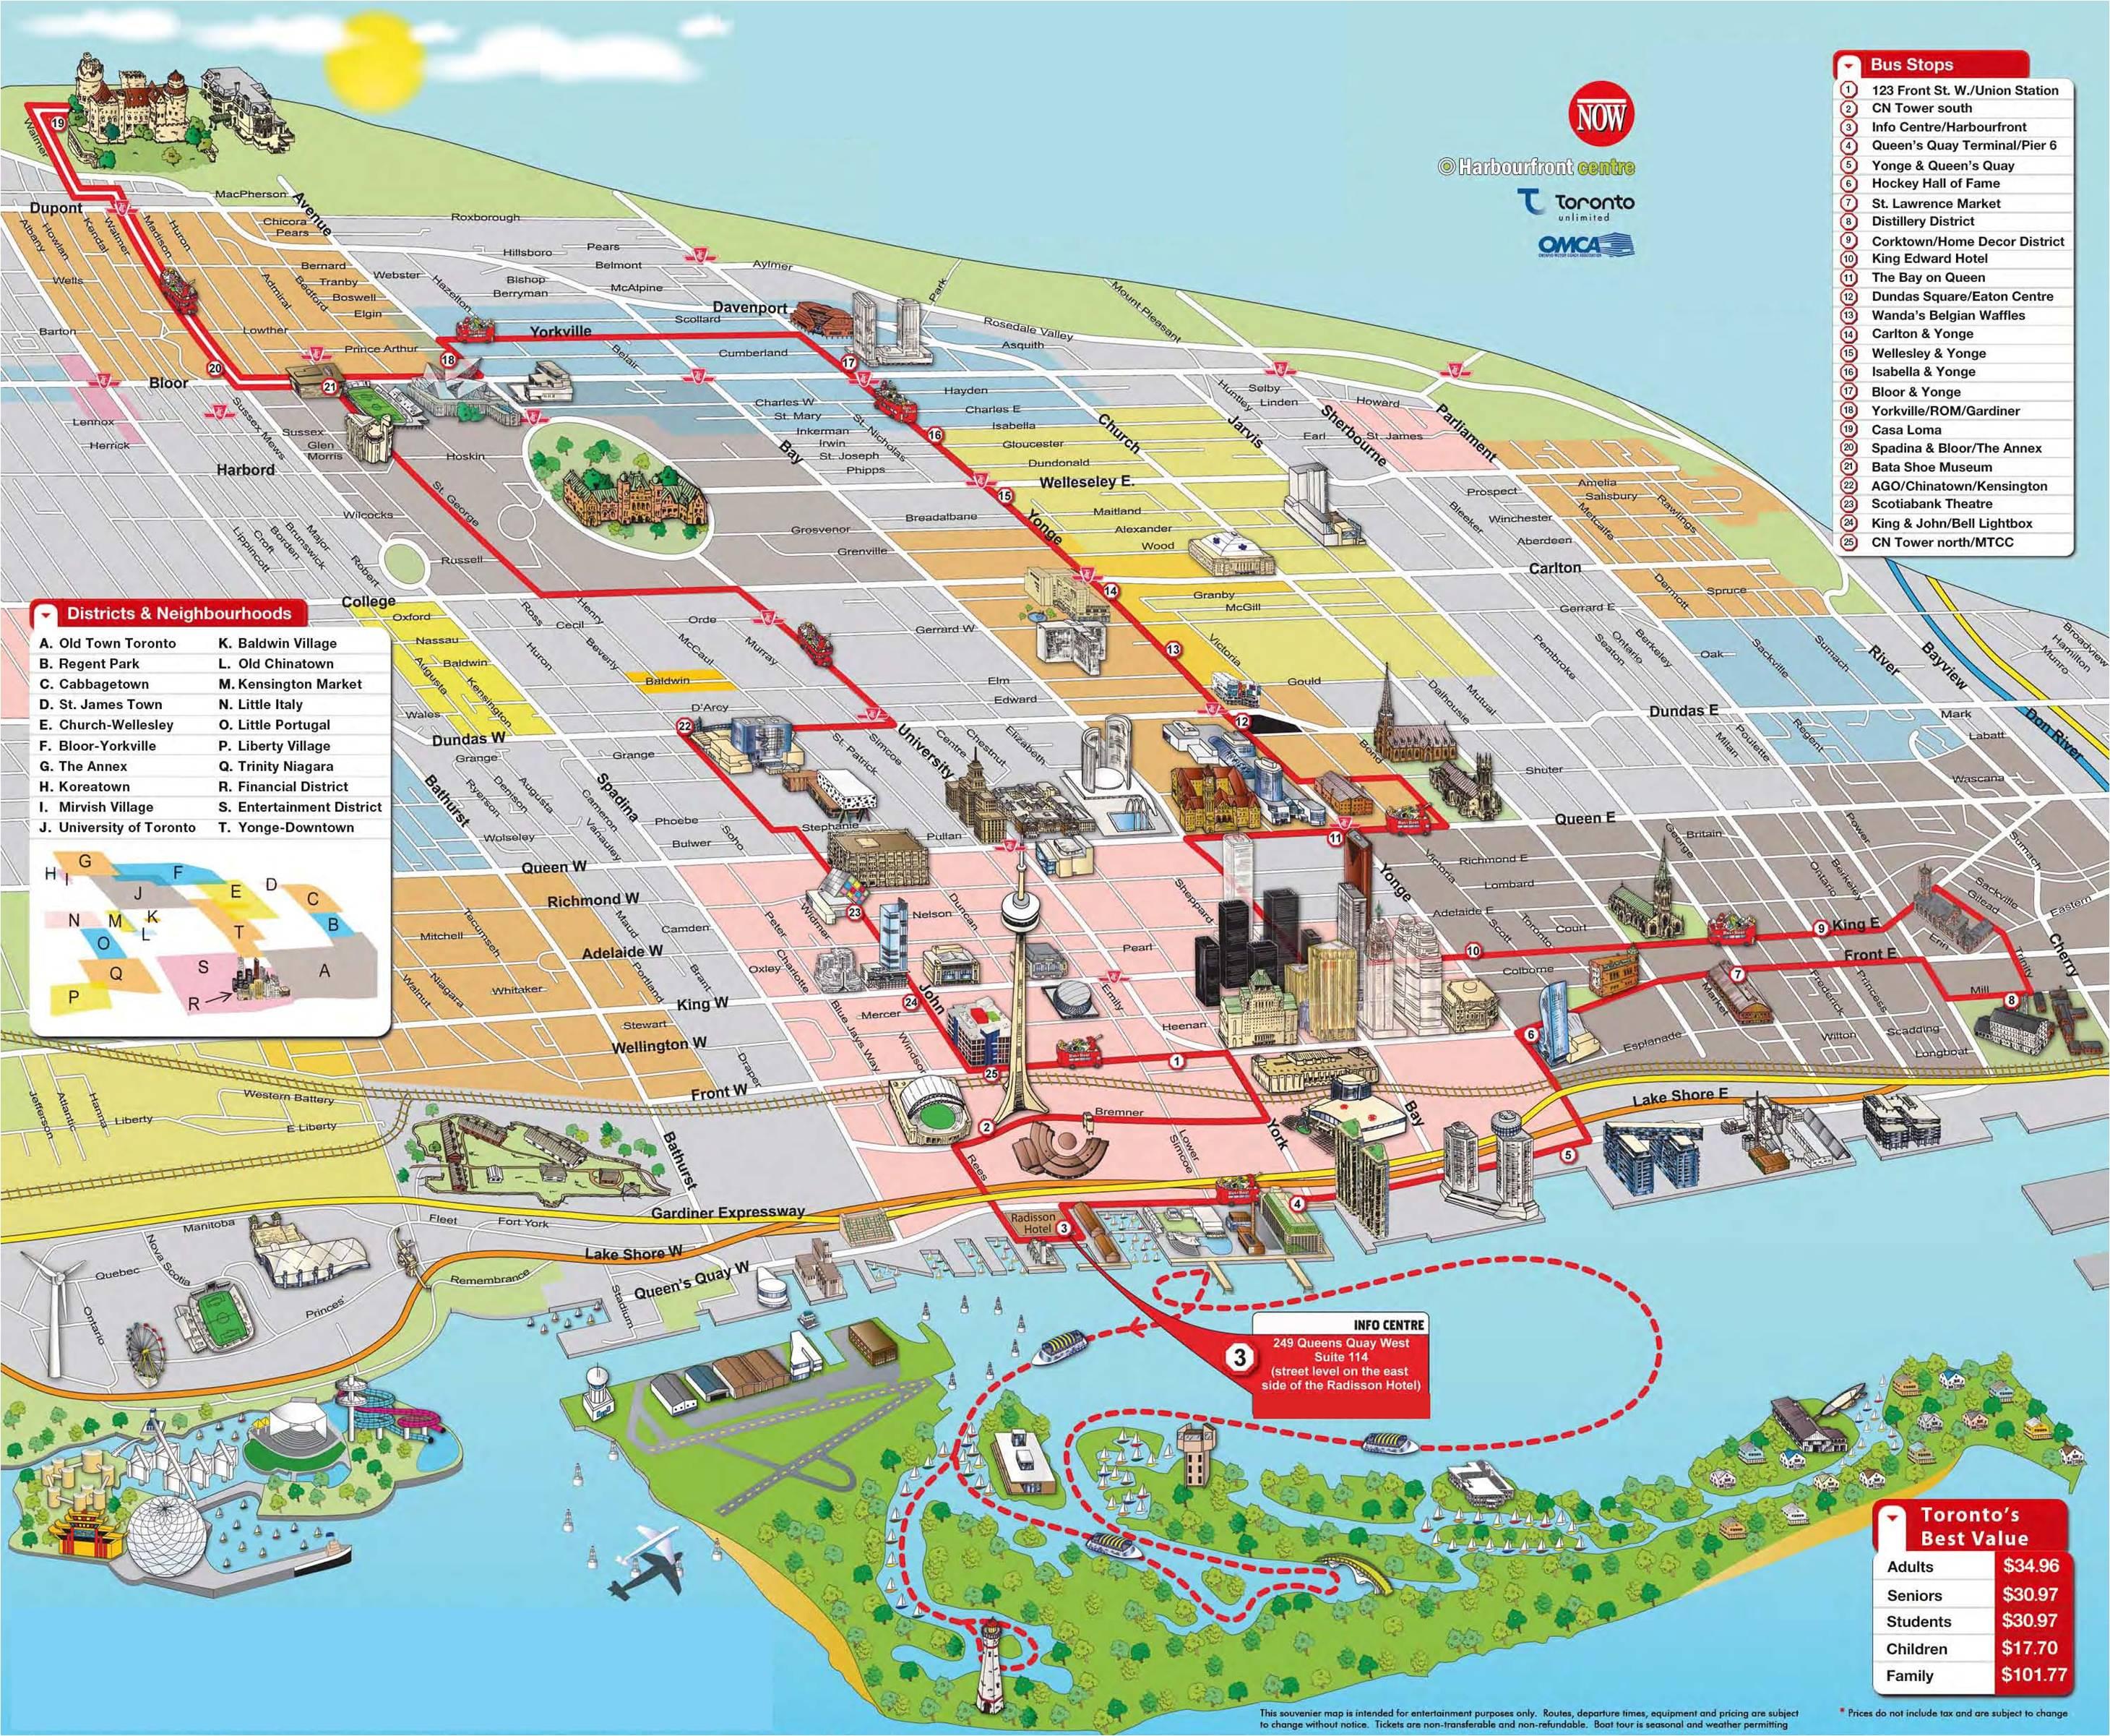 Mapa de Berln  Mapa Fsico Geogrfico Poltico turstico y